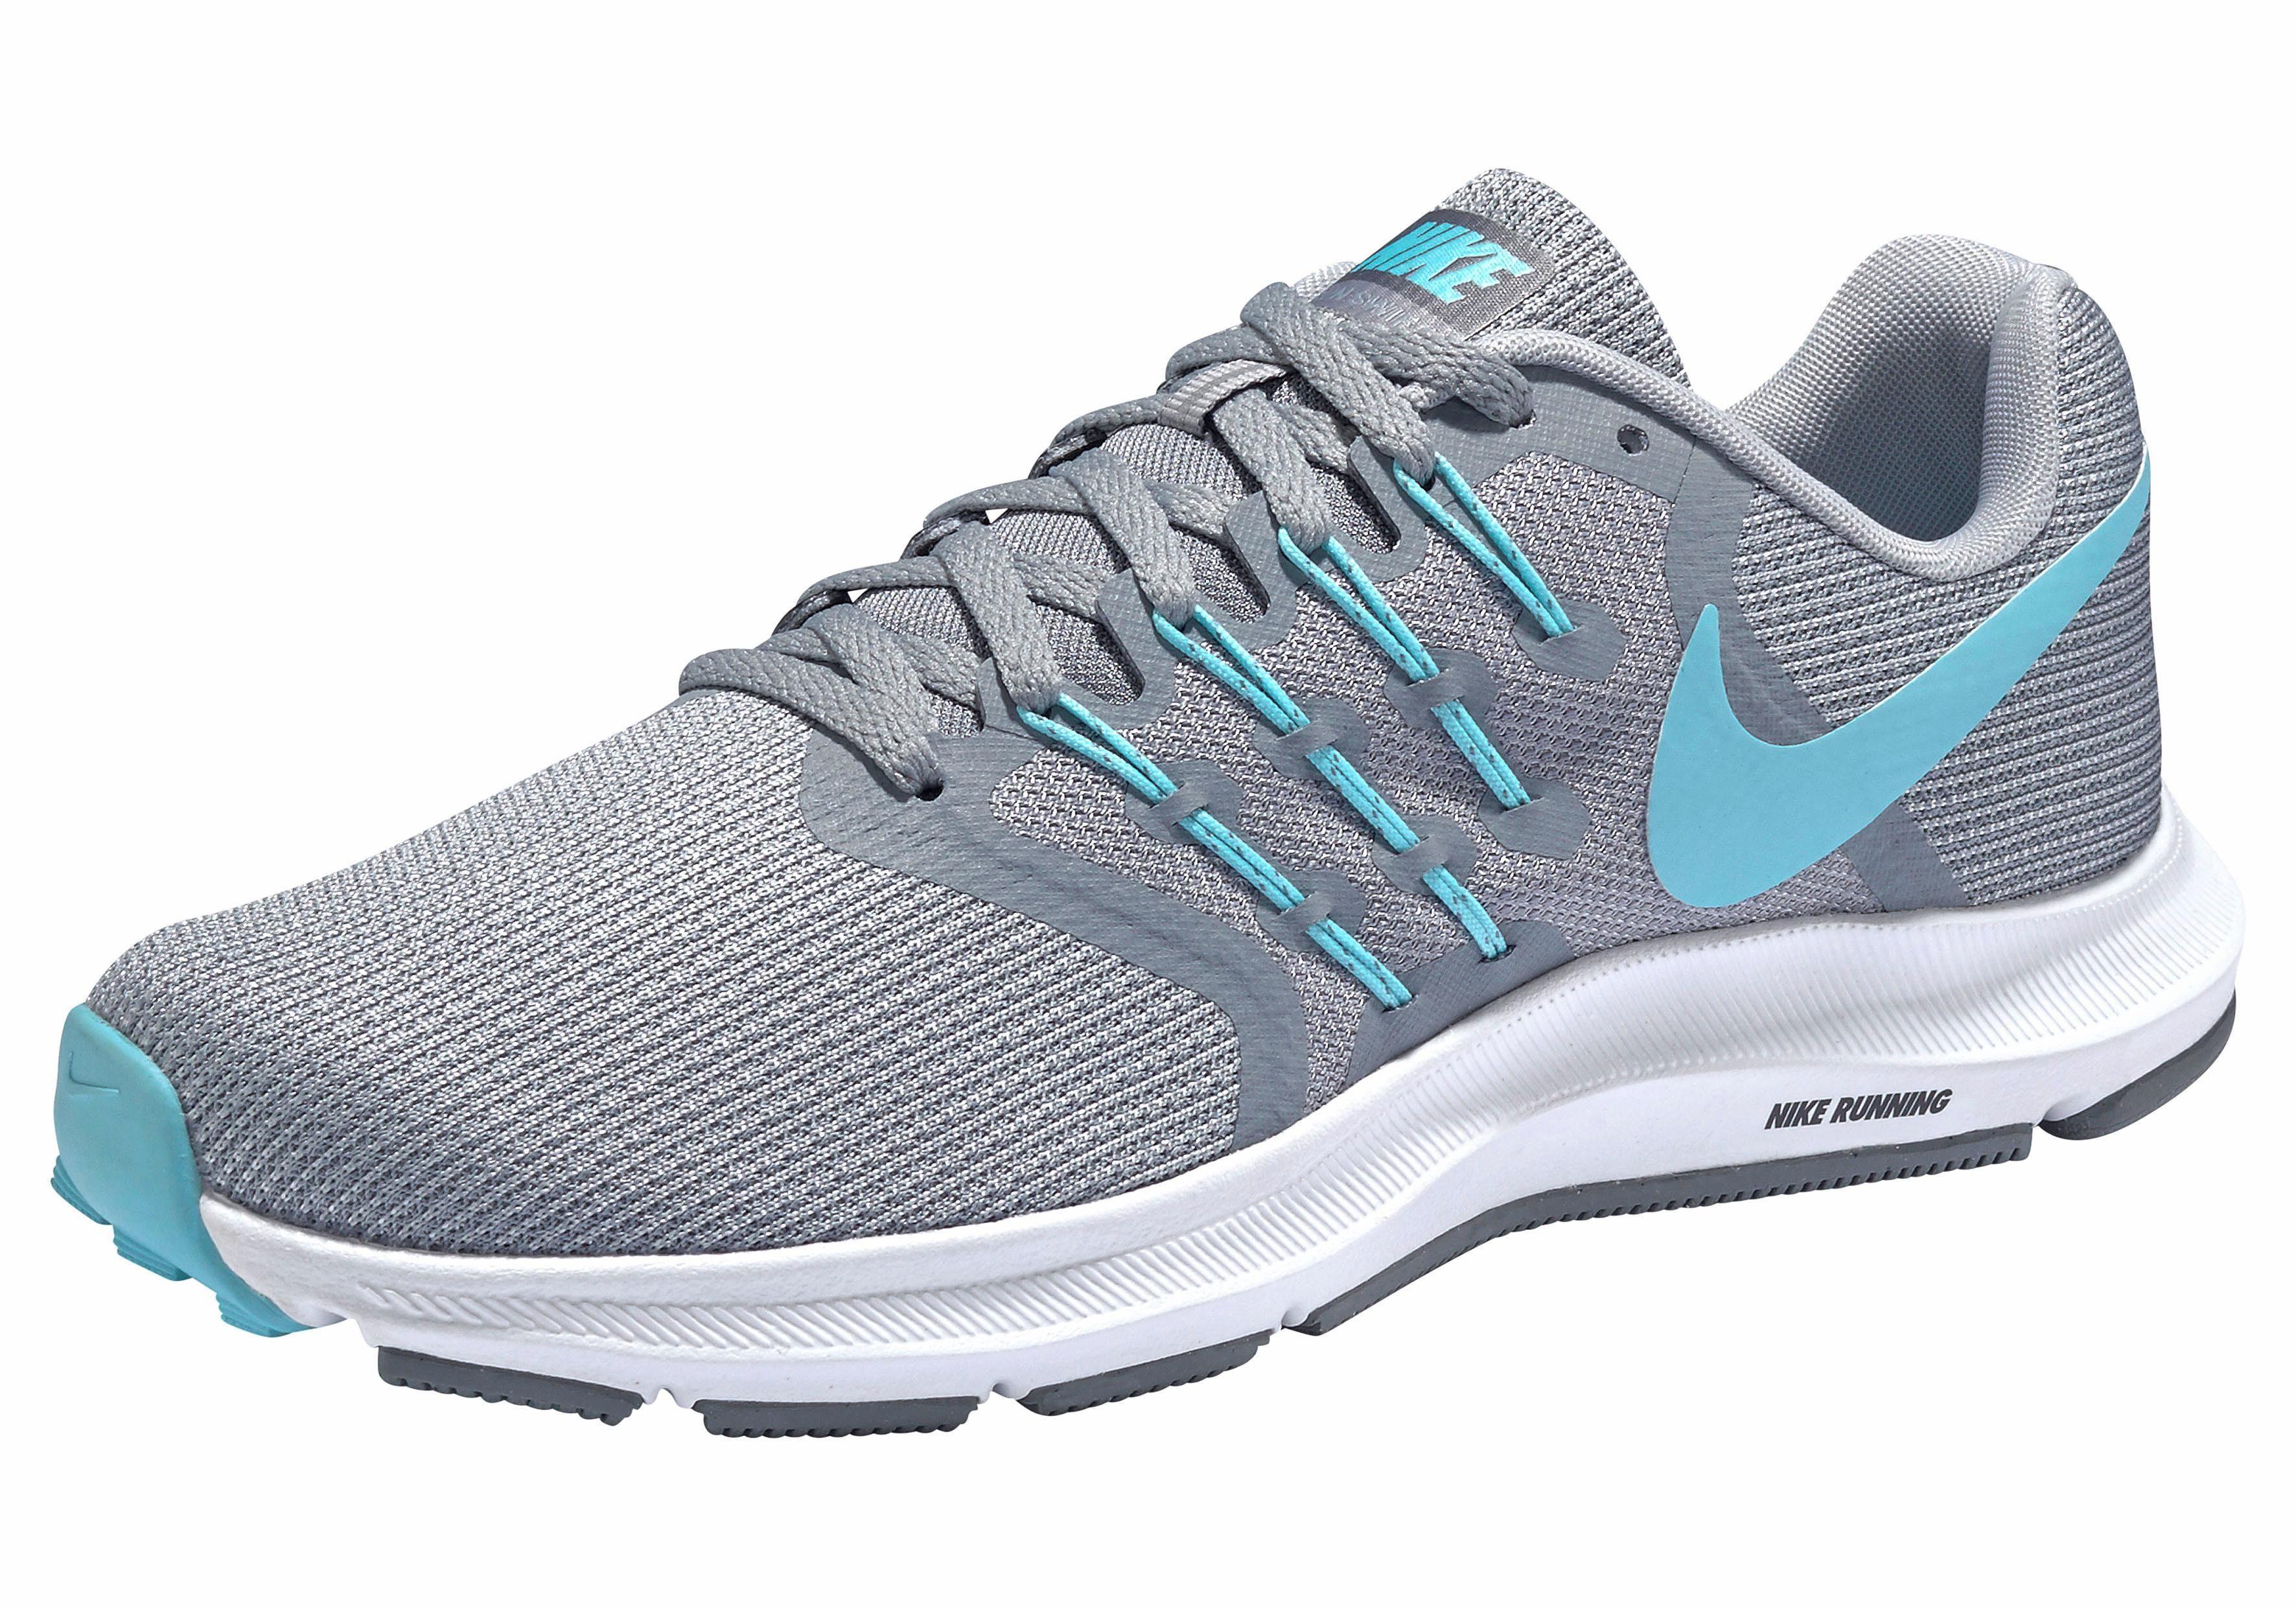 Nike Wmns Run Swift Laufschuh online kaufen  grau-türkis